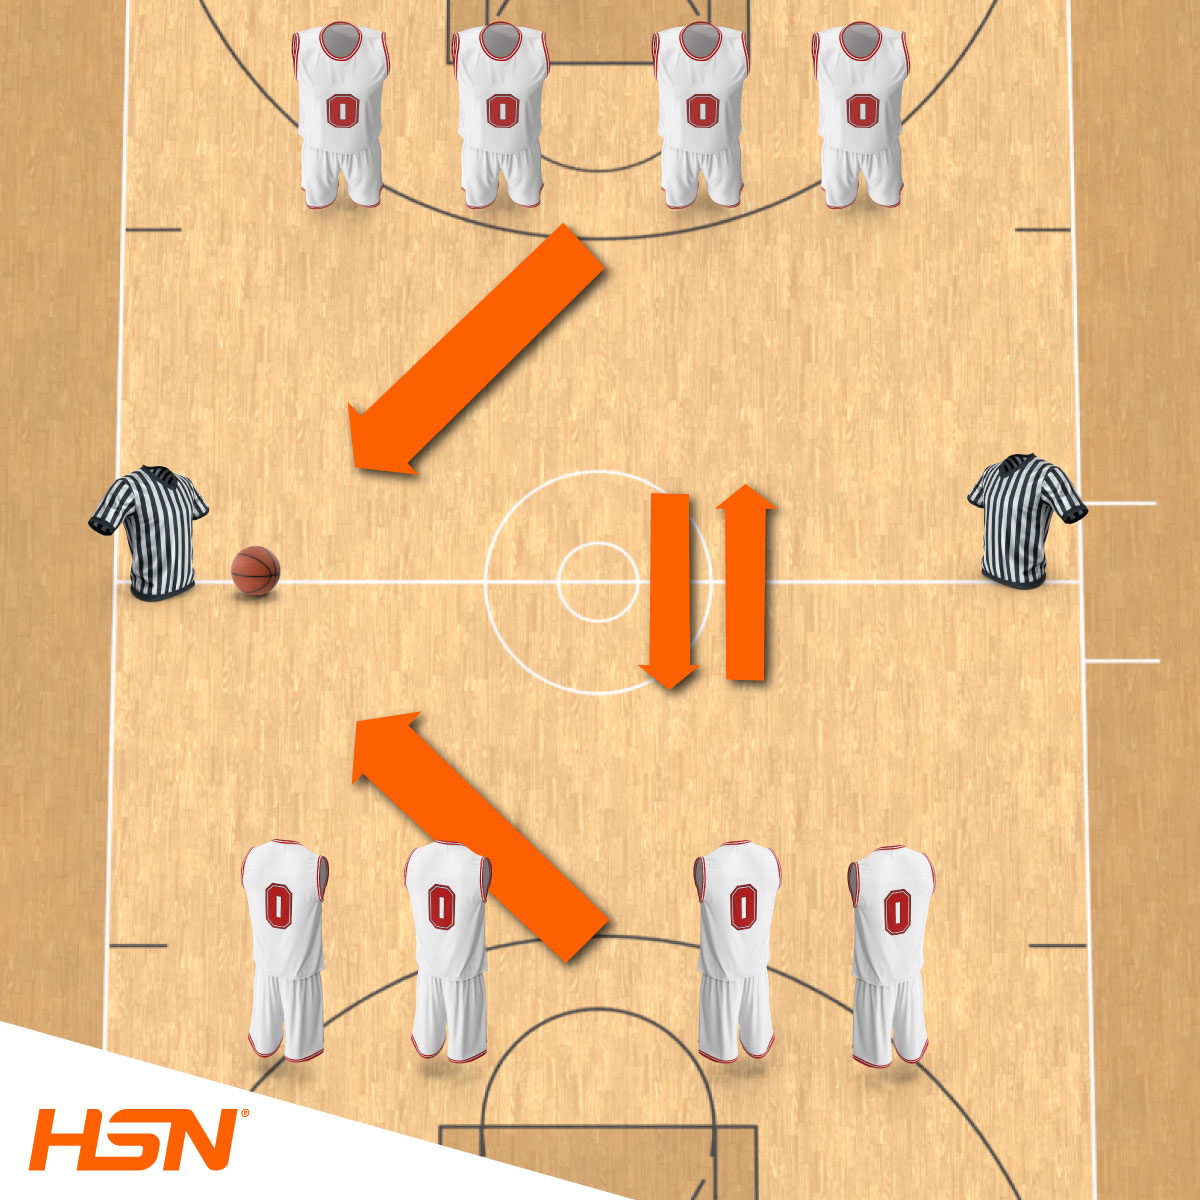 treino funcional basquetebol 4